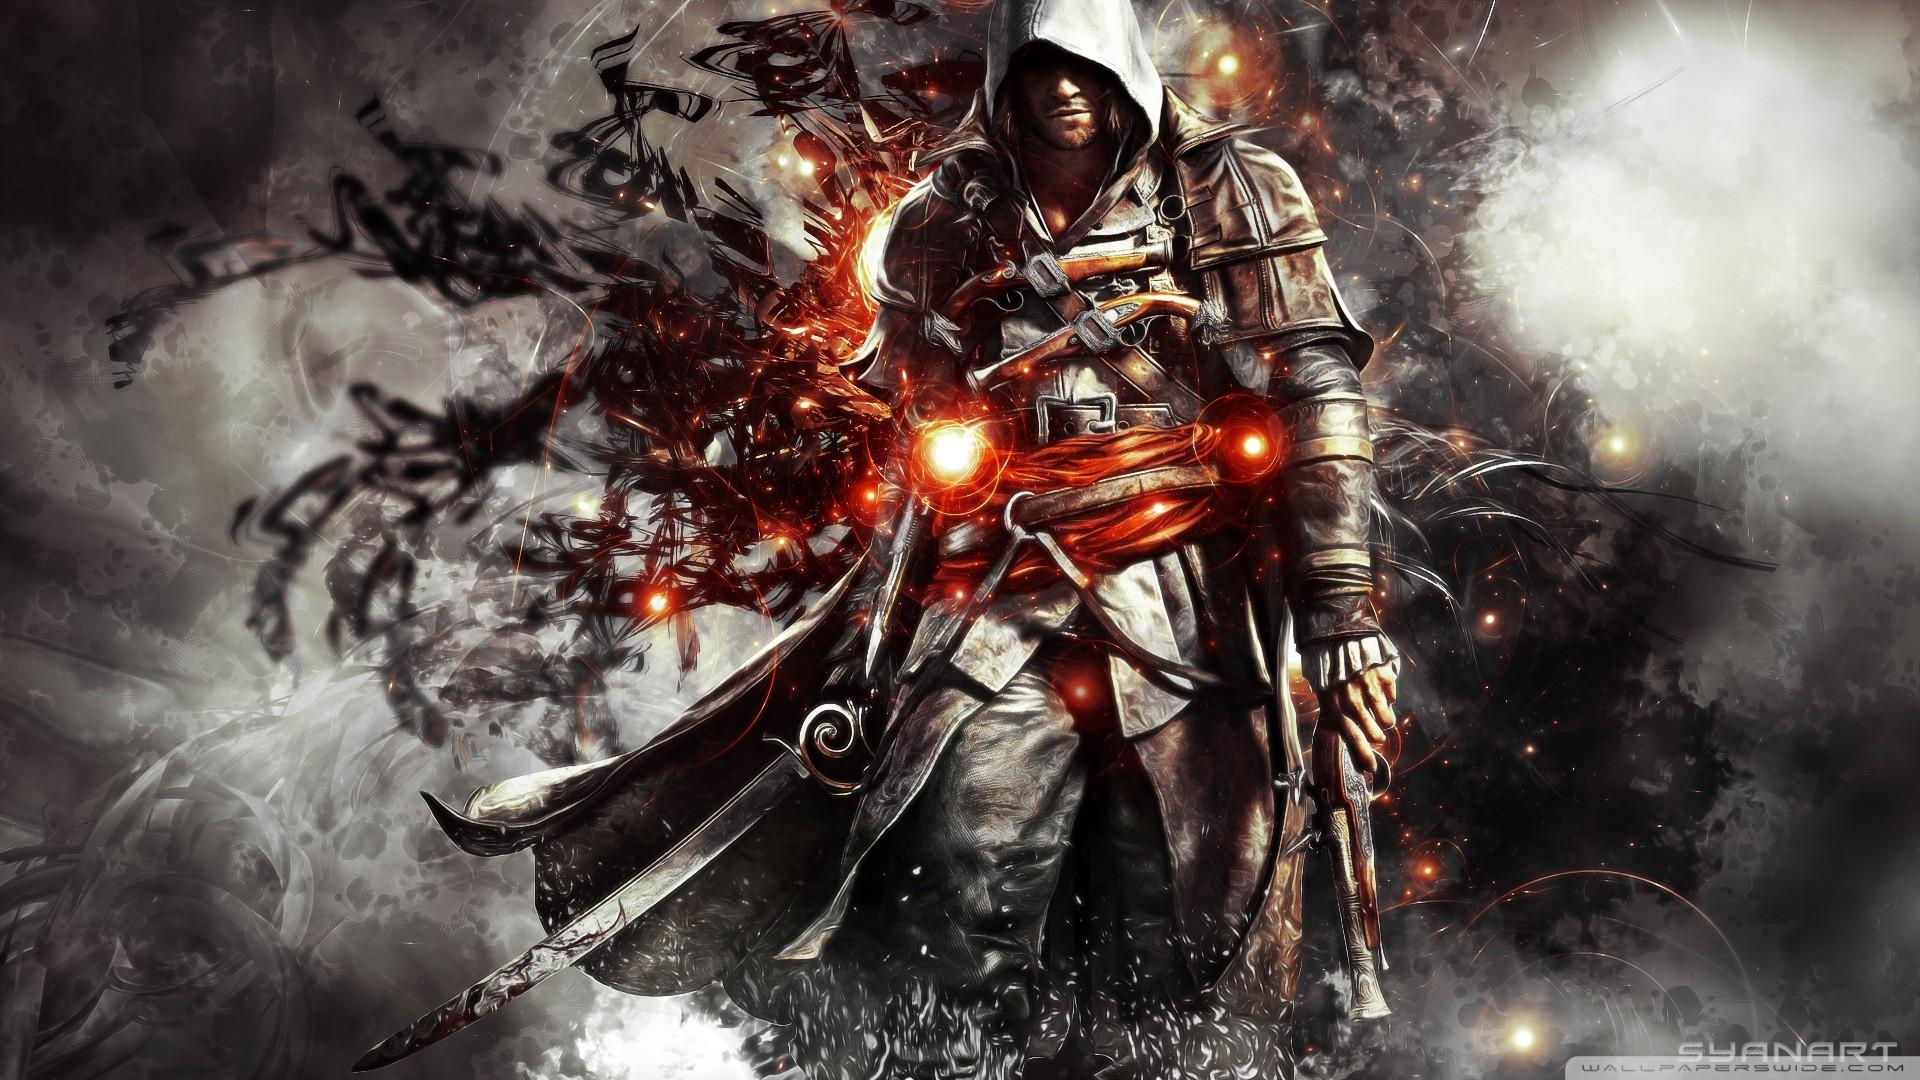 Res: 1920x1080, Assassin's creed IV dark power